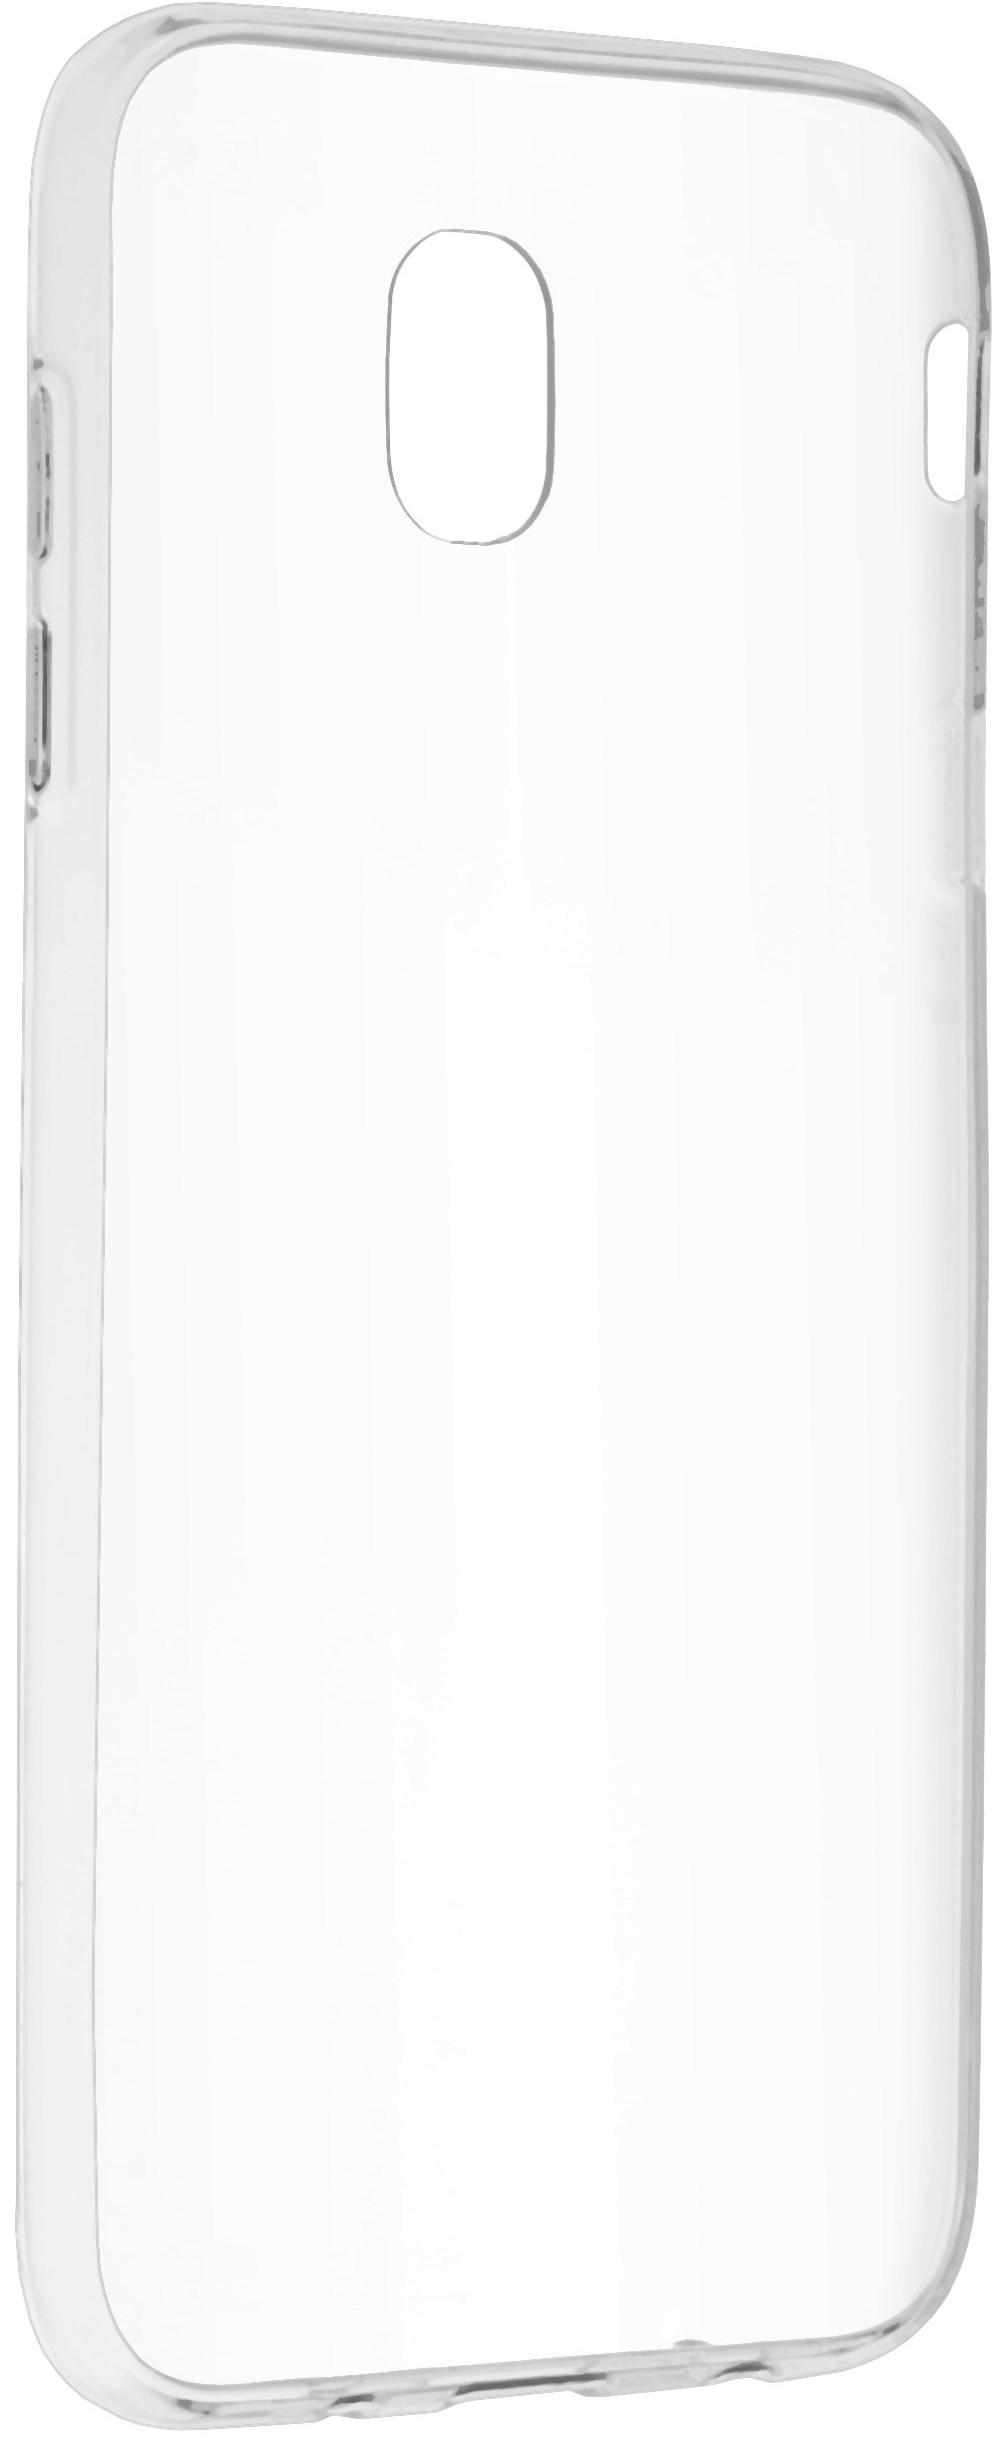 Чехол для сотового телефона skinBOX Slim Silicone, 4660041409185, прозрачный чехол для сотового телефона skinbox slim silicone 4660041408157 прозрачный